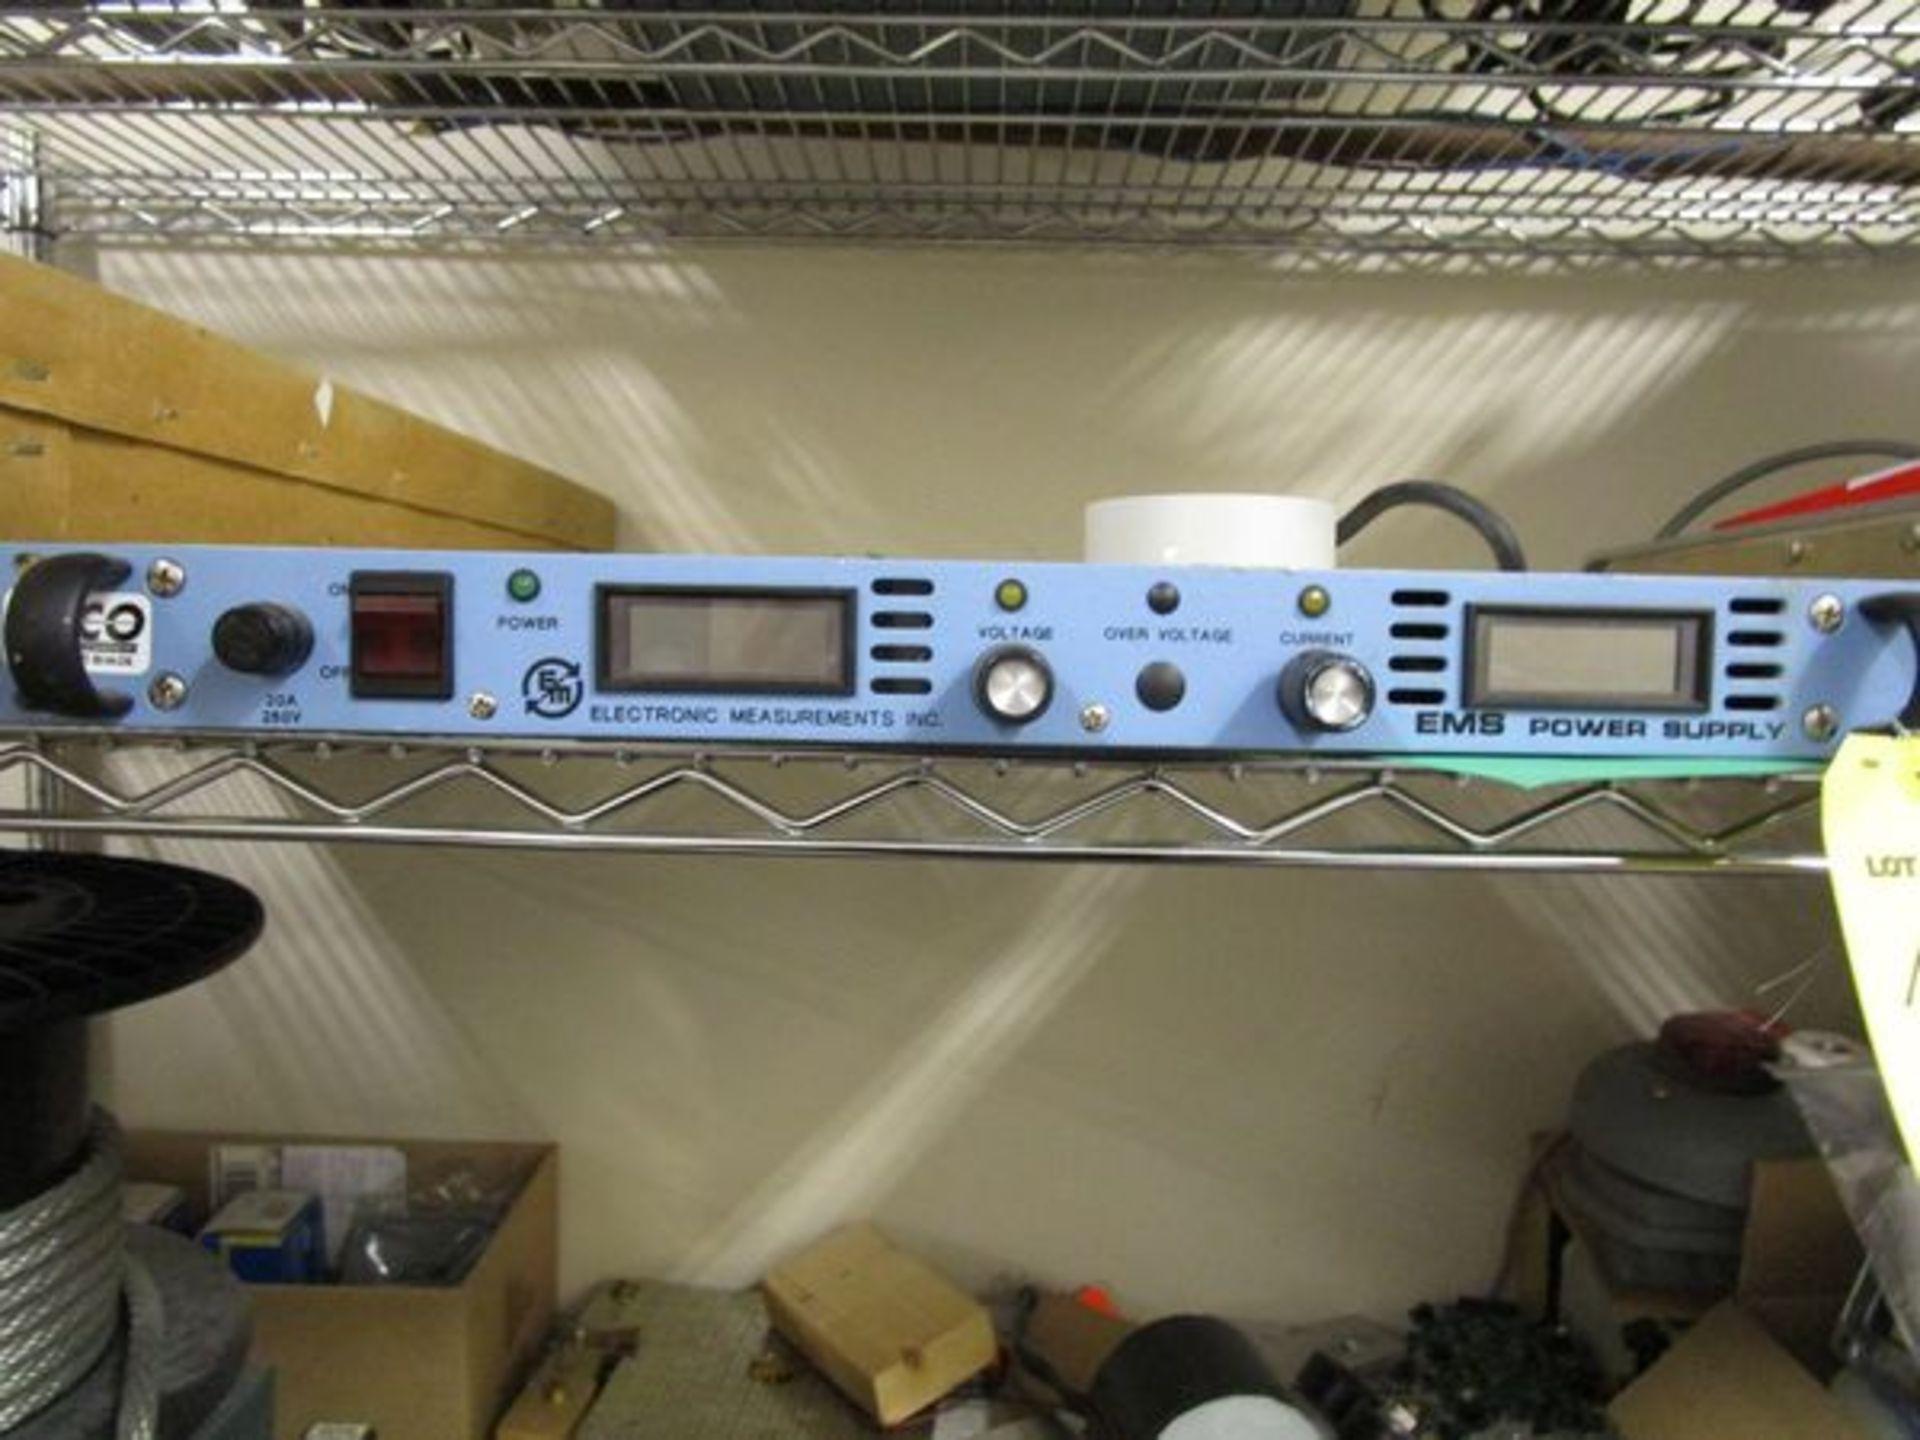 EMS Power Supply